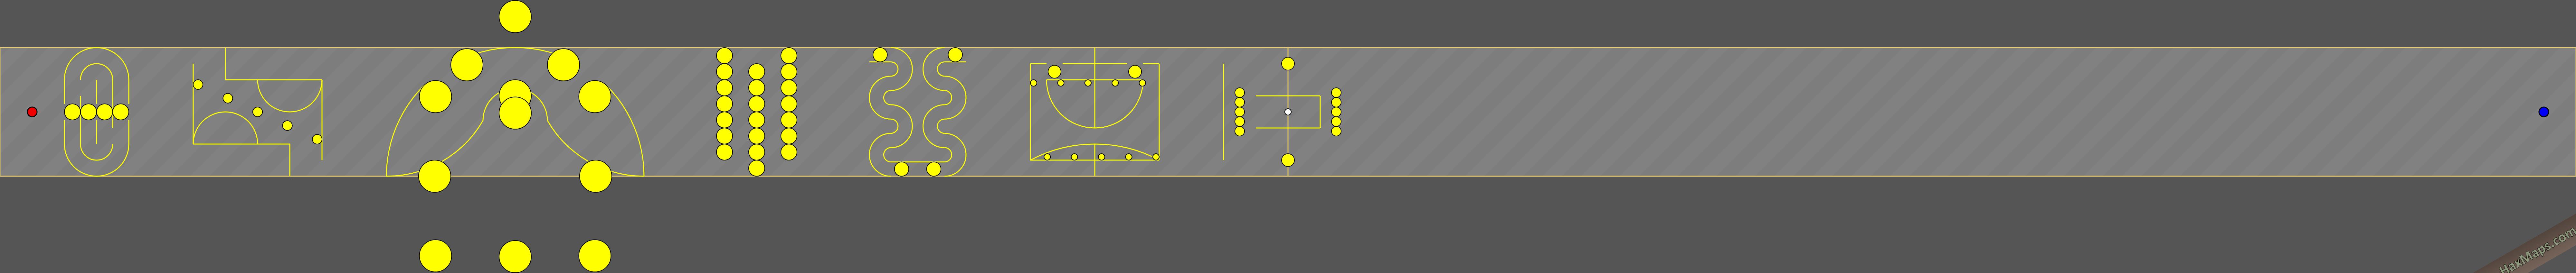 hax ball maps | Yellow-9